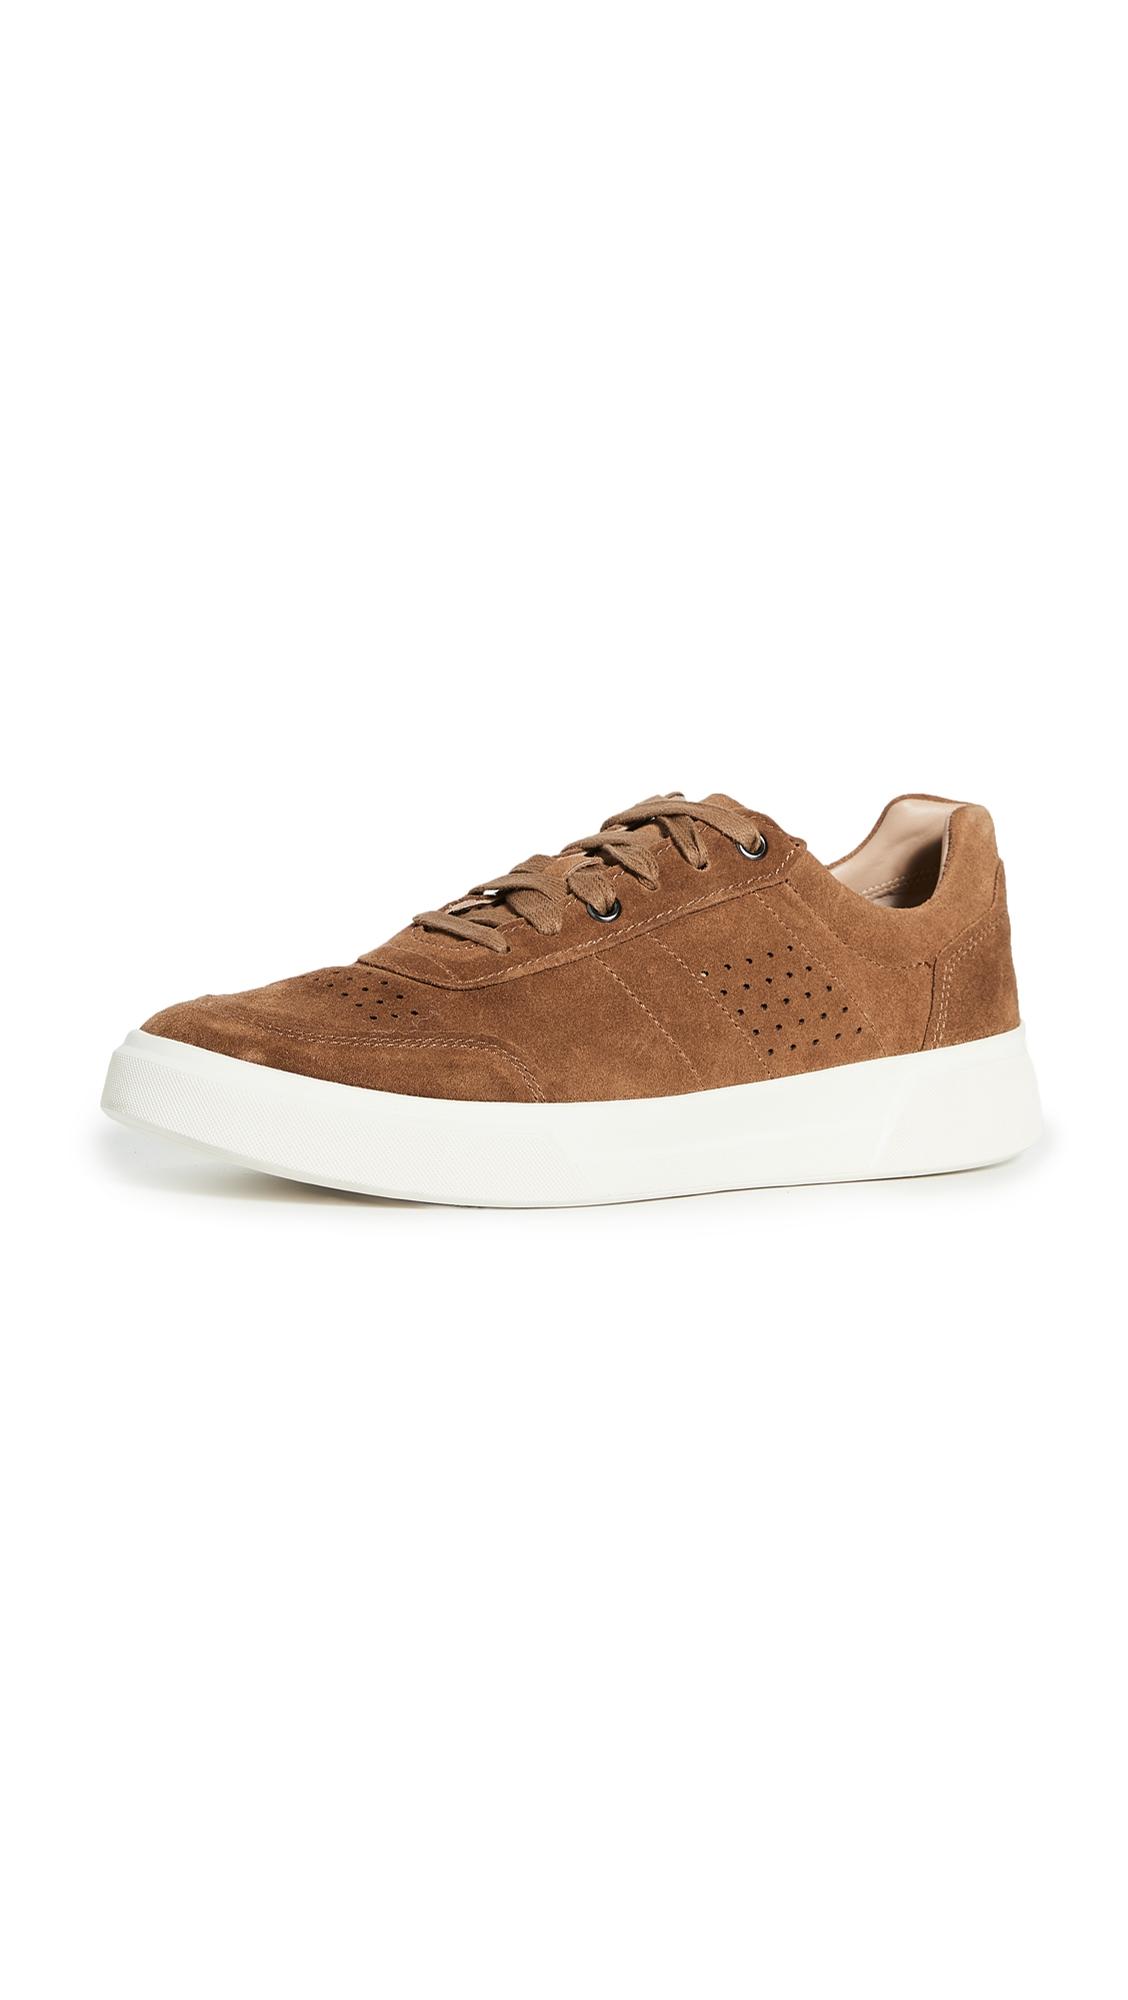 Vince Men's Barnett Perforated Suede Low-top Sneakers In Tobacco